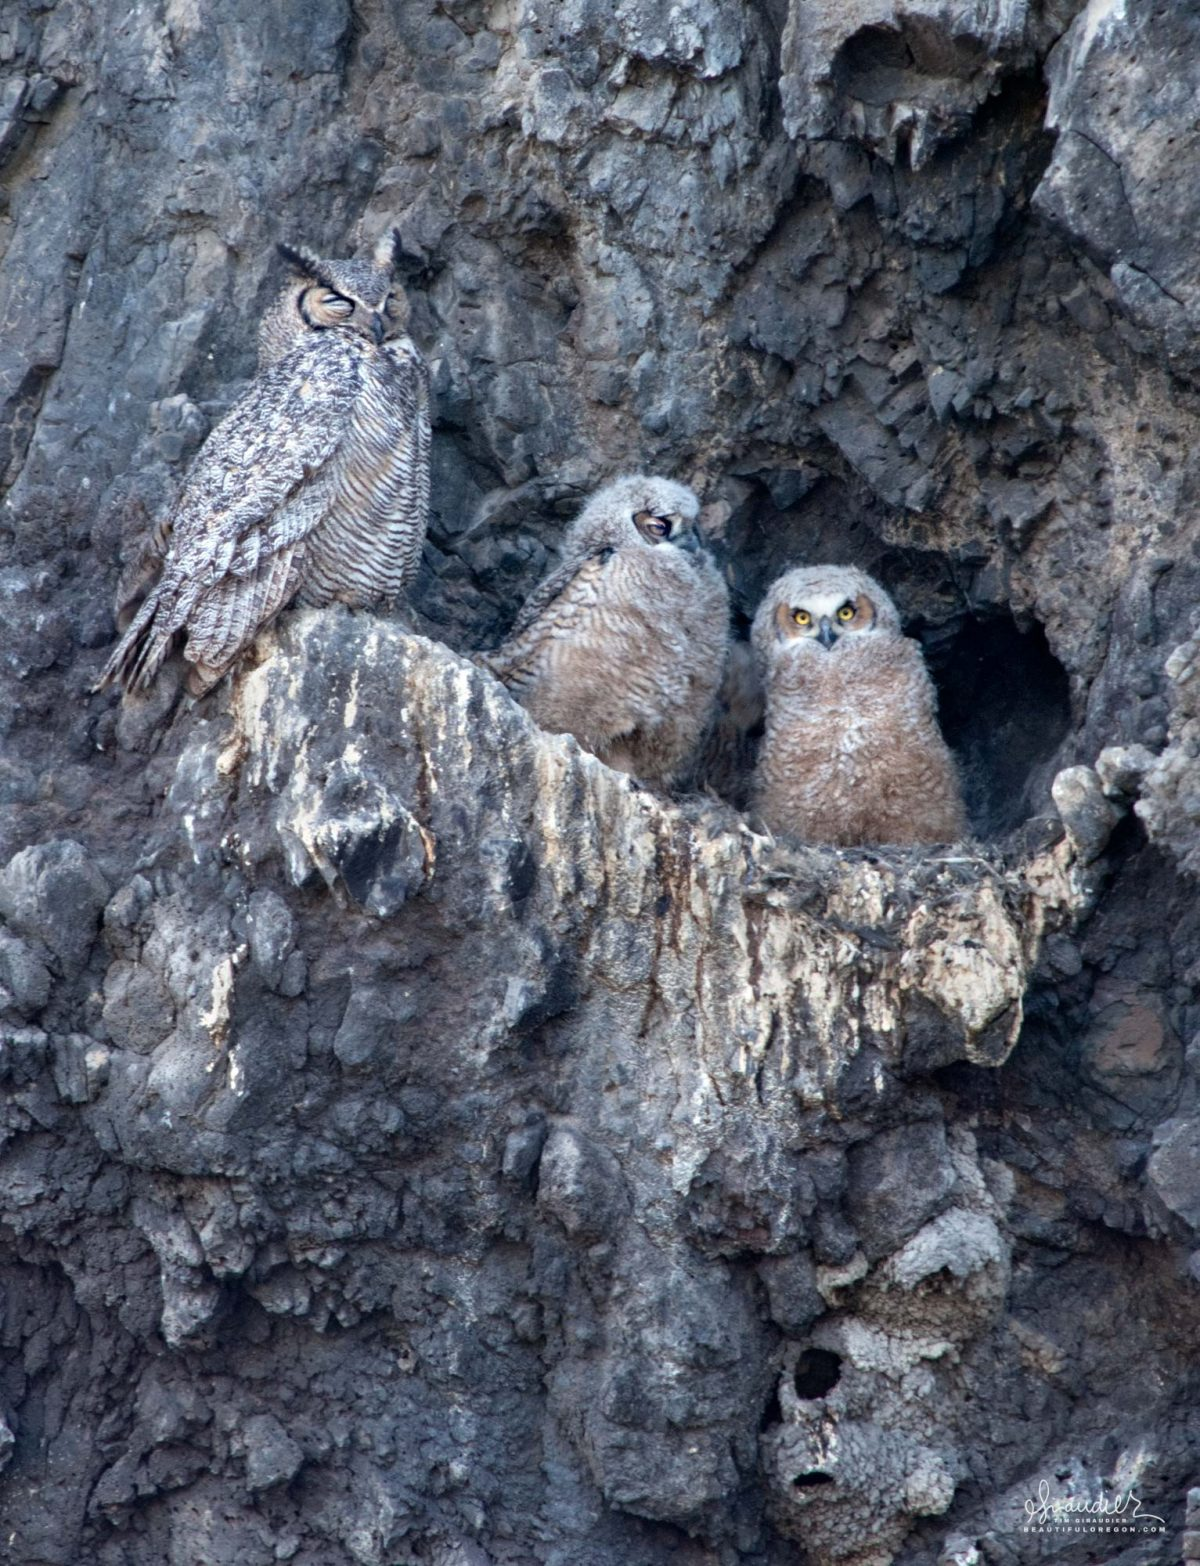 Nesting Great Horned Owl (Bubo virginianus) with owlets. Lower Klamath National Wildlife Refuge, Siskiyou County, California. Bird watching photography